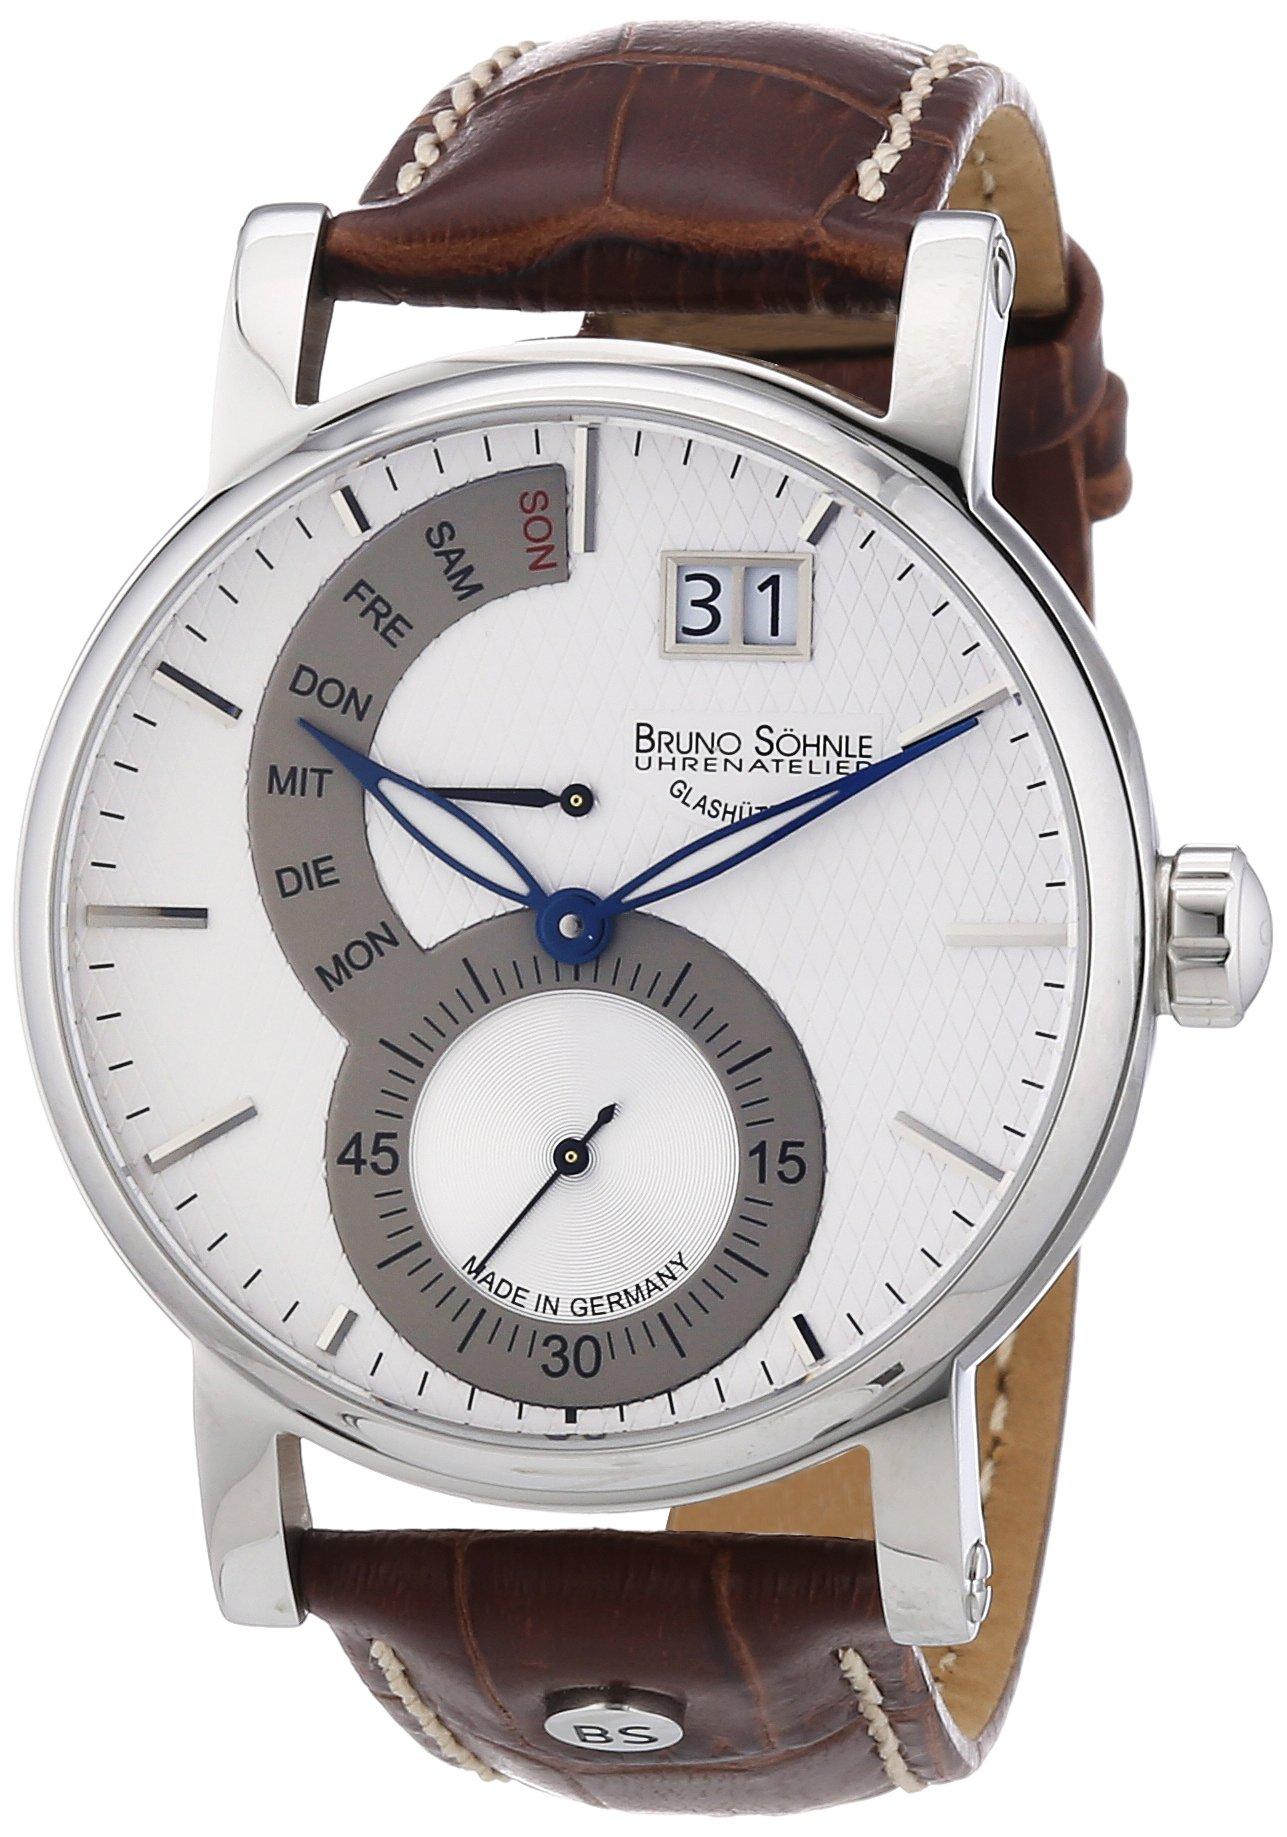 Herren-Armbanduhr Pesaro II Analog Quarz Leder 17-13073-283